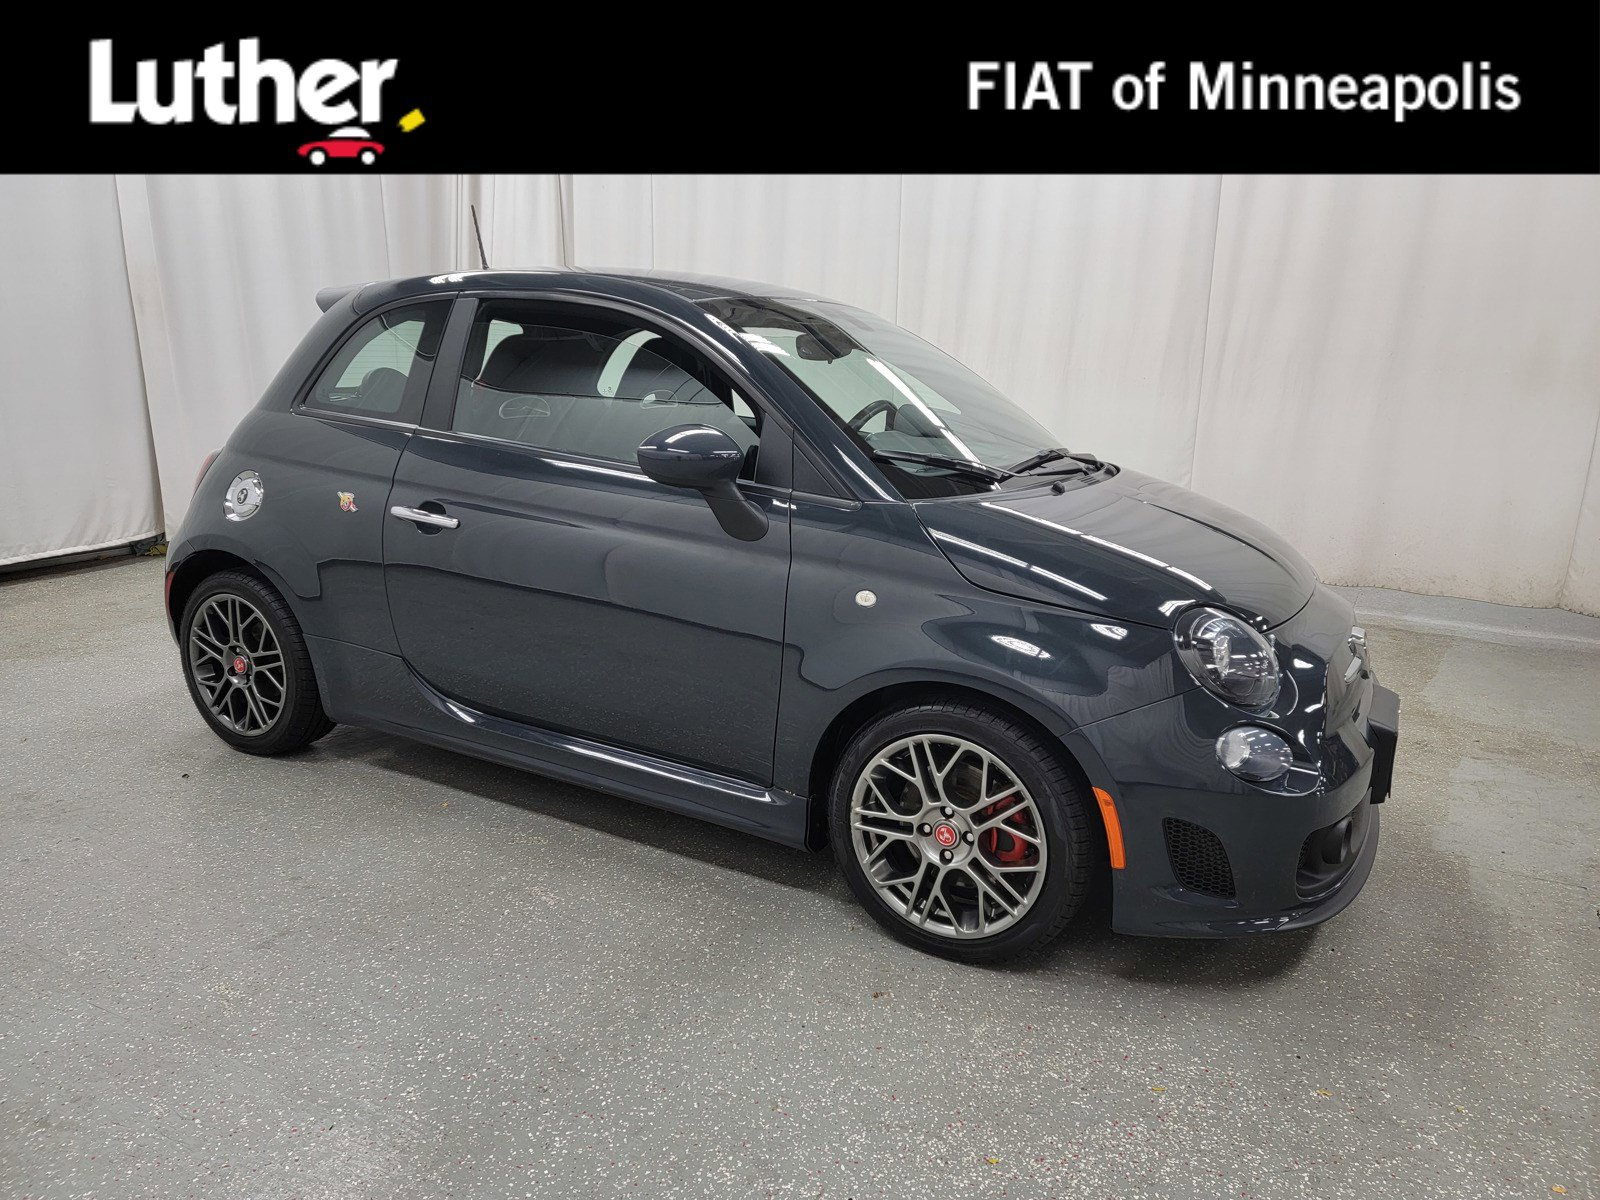 2017 FIAT 500 Abarth Minneapolis MN